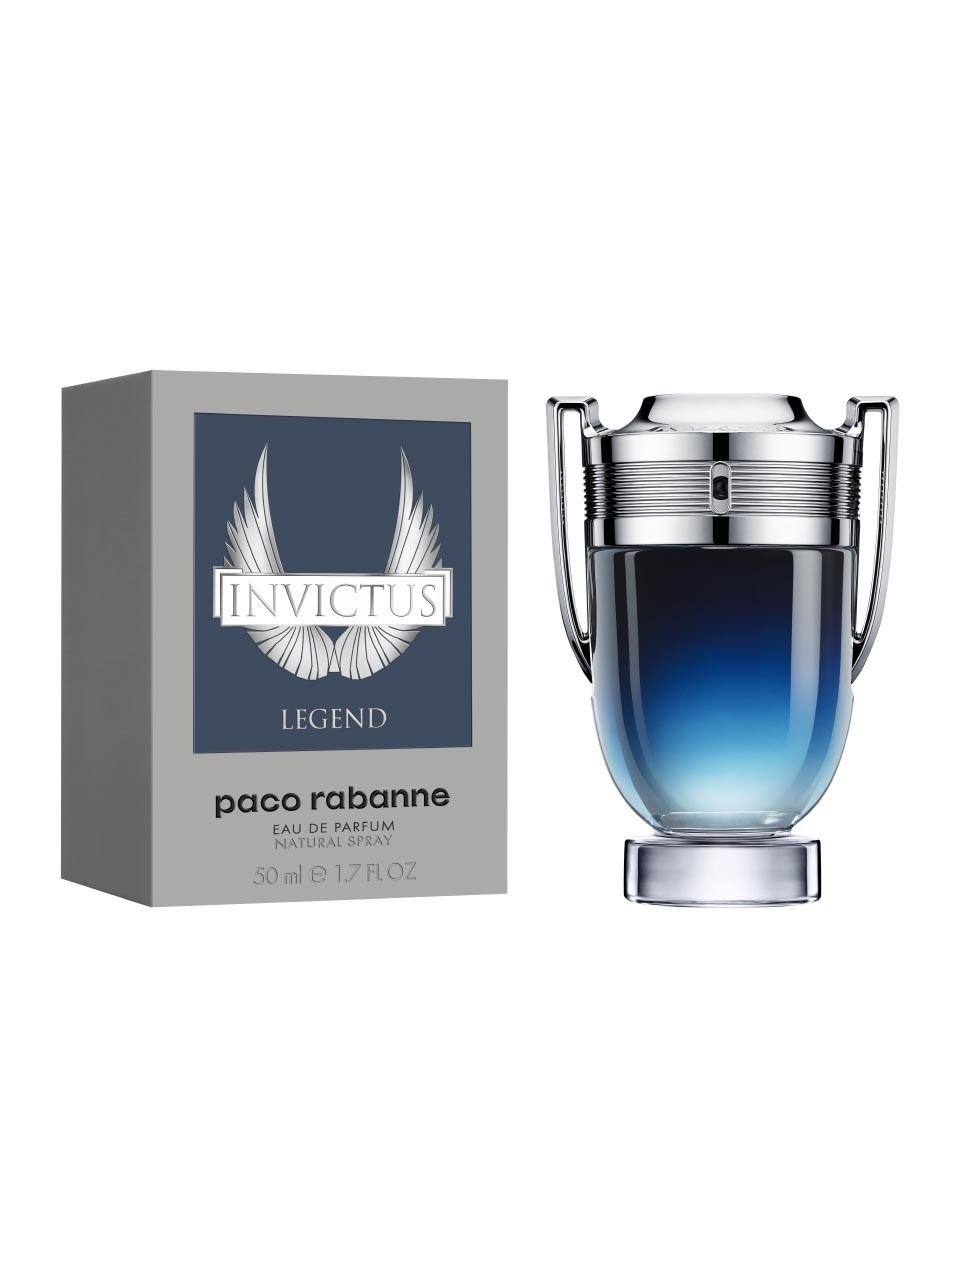 Invictus Legend Paco Rabanne одеколон новый аромат для мужчин 2019